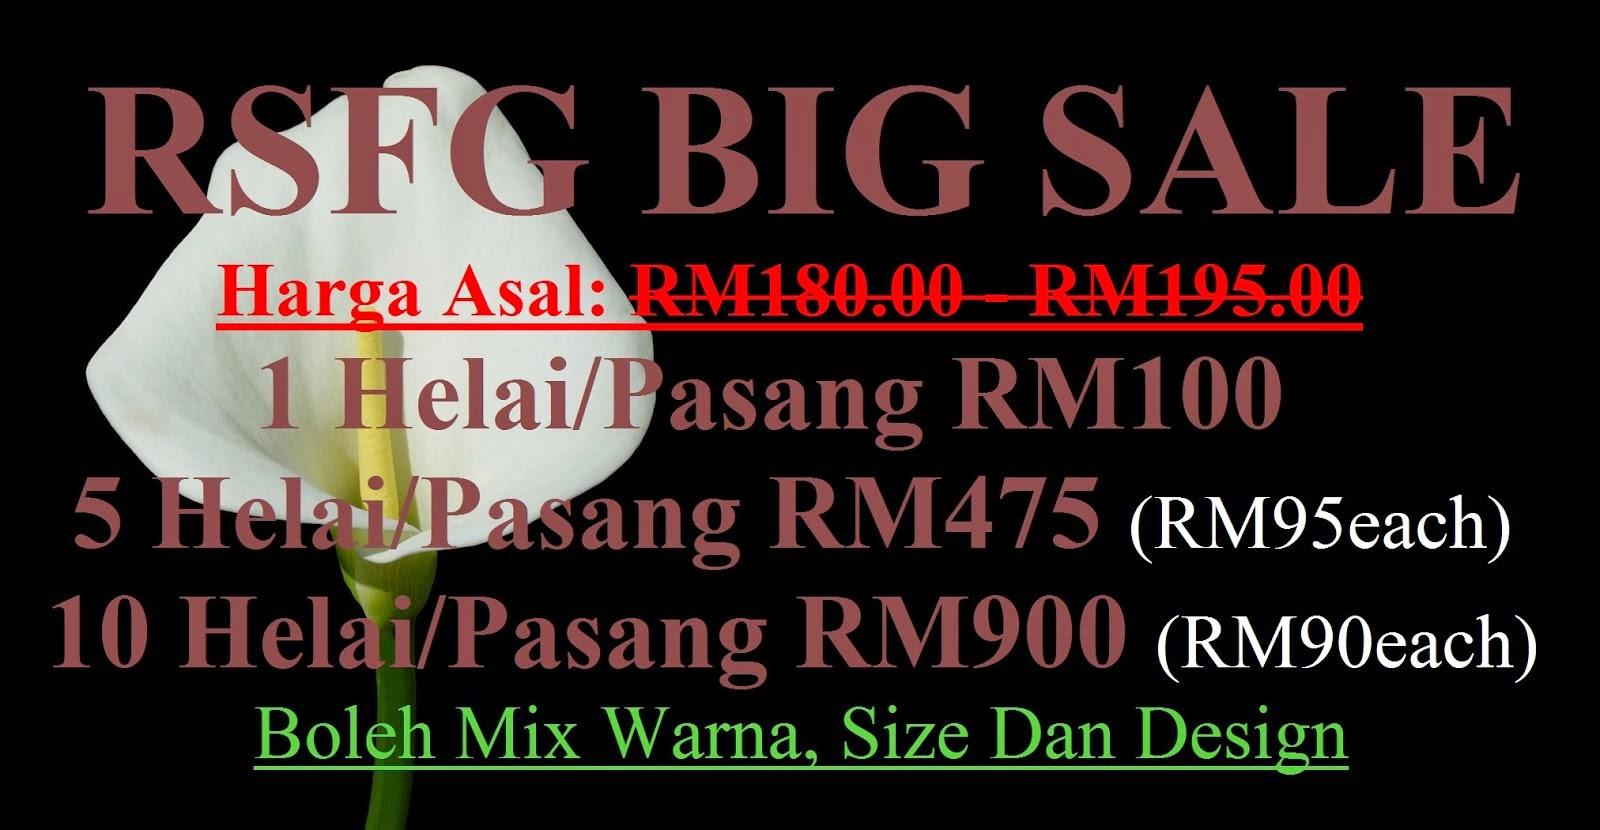 RSFG BIG SALE